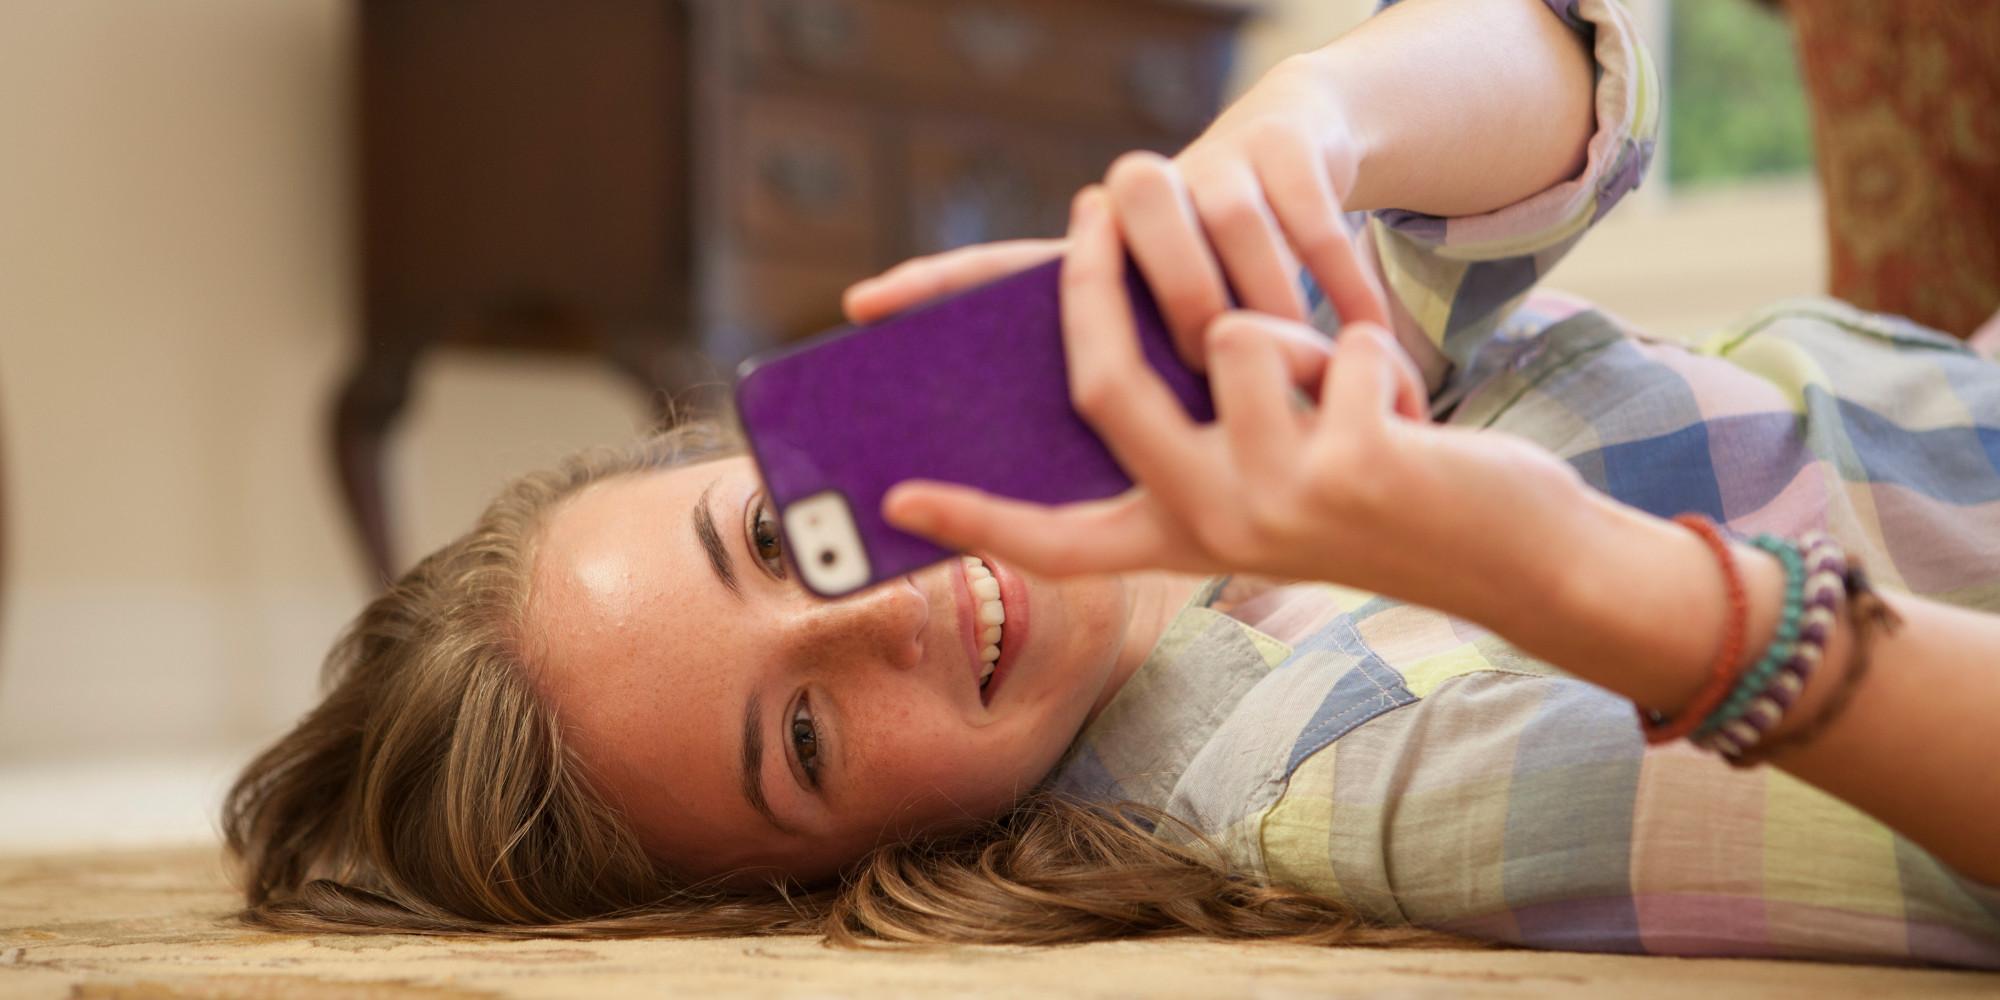 GIRL-USING-SMARTPHONE